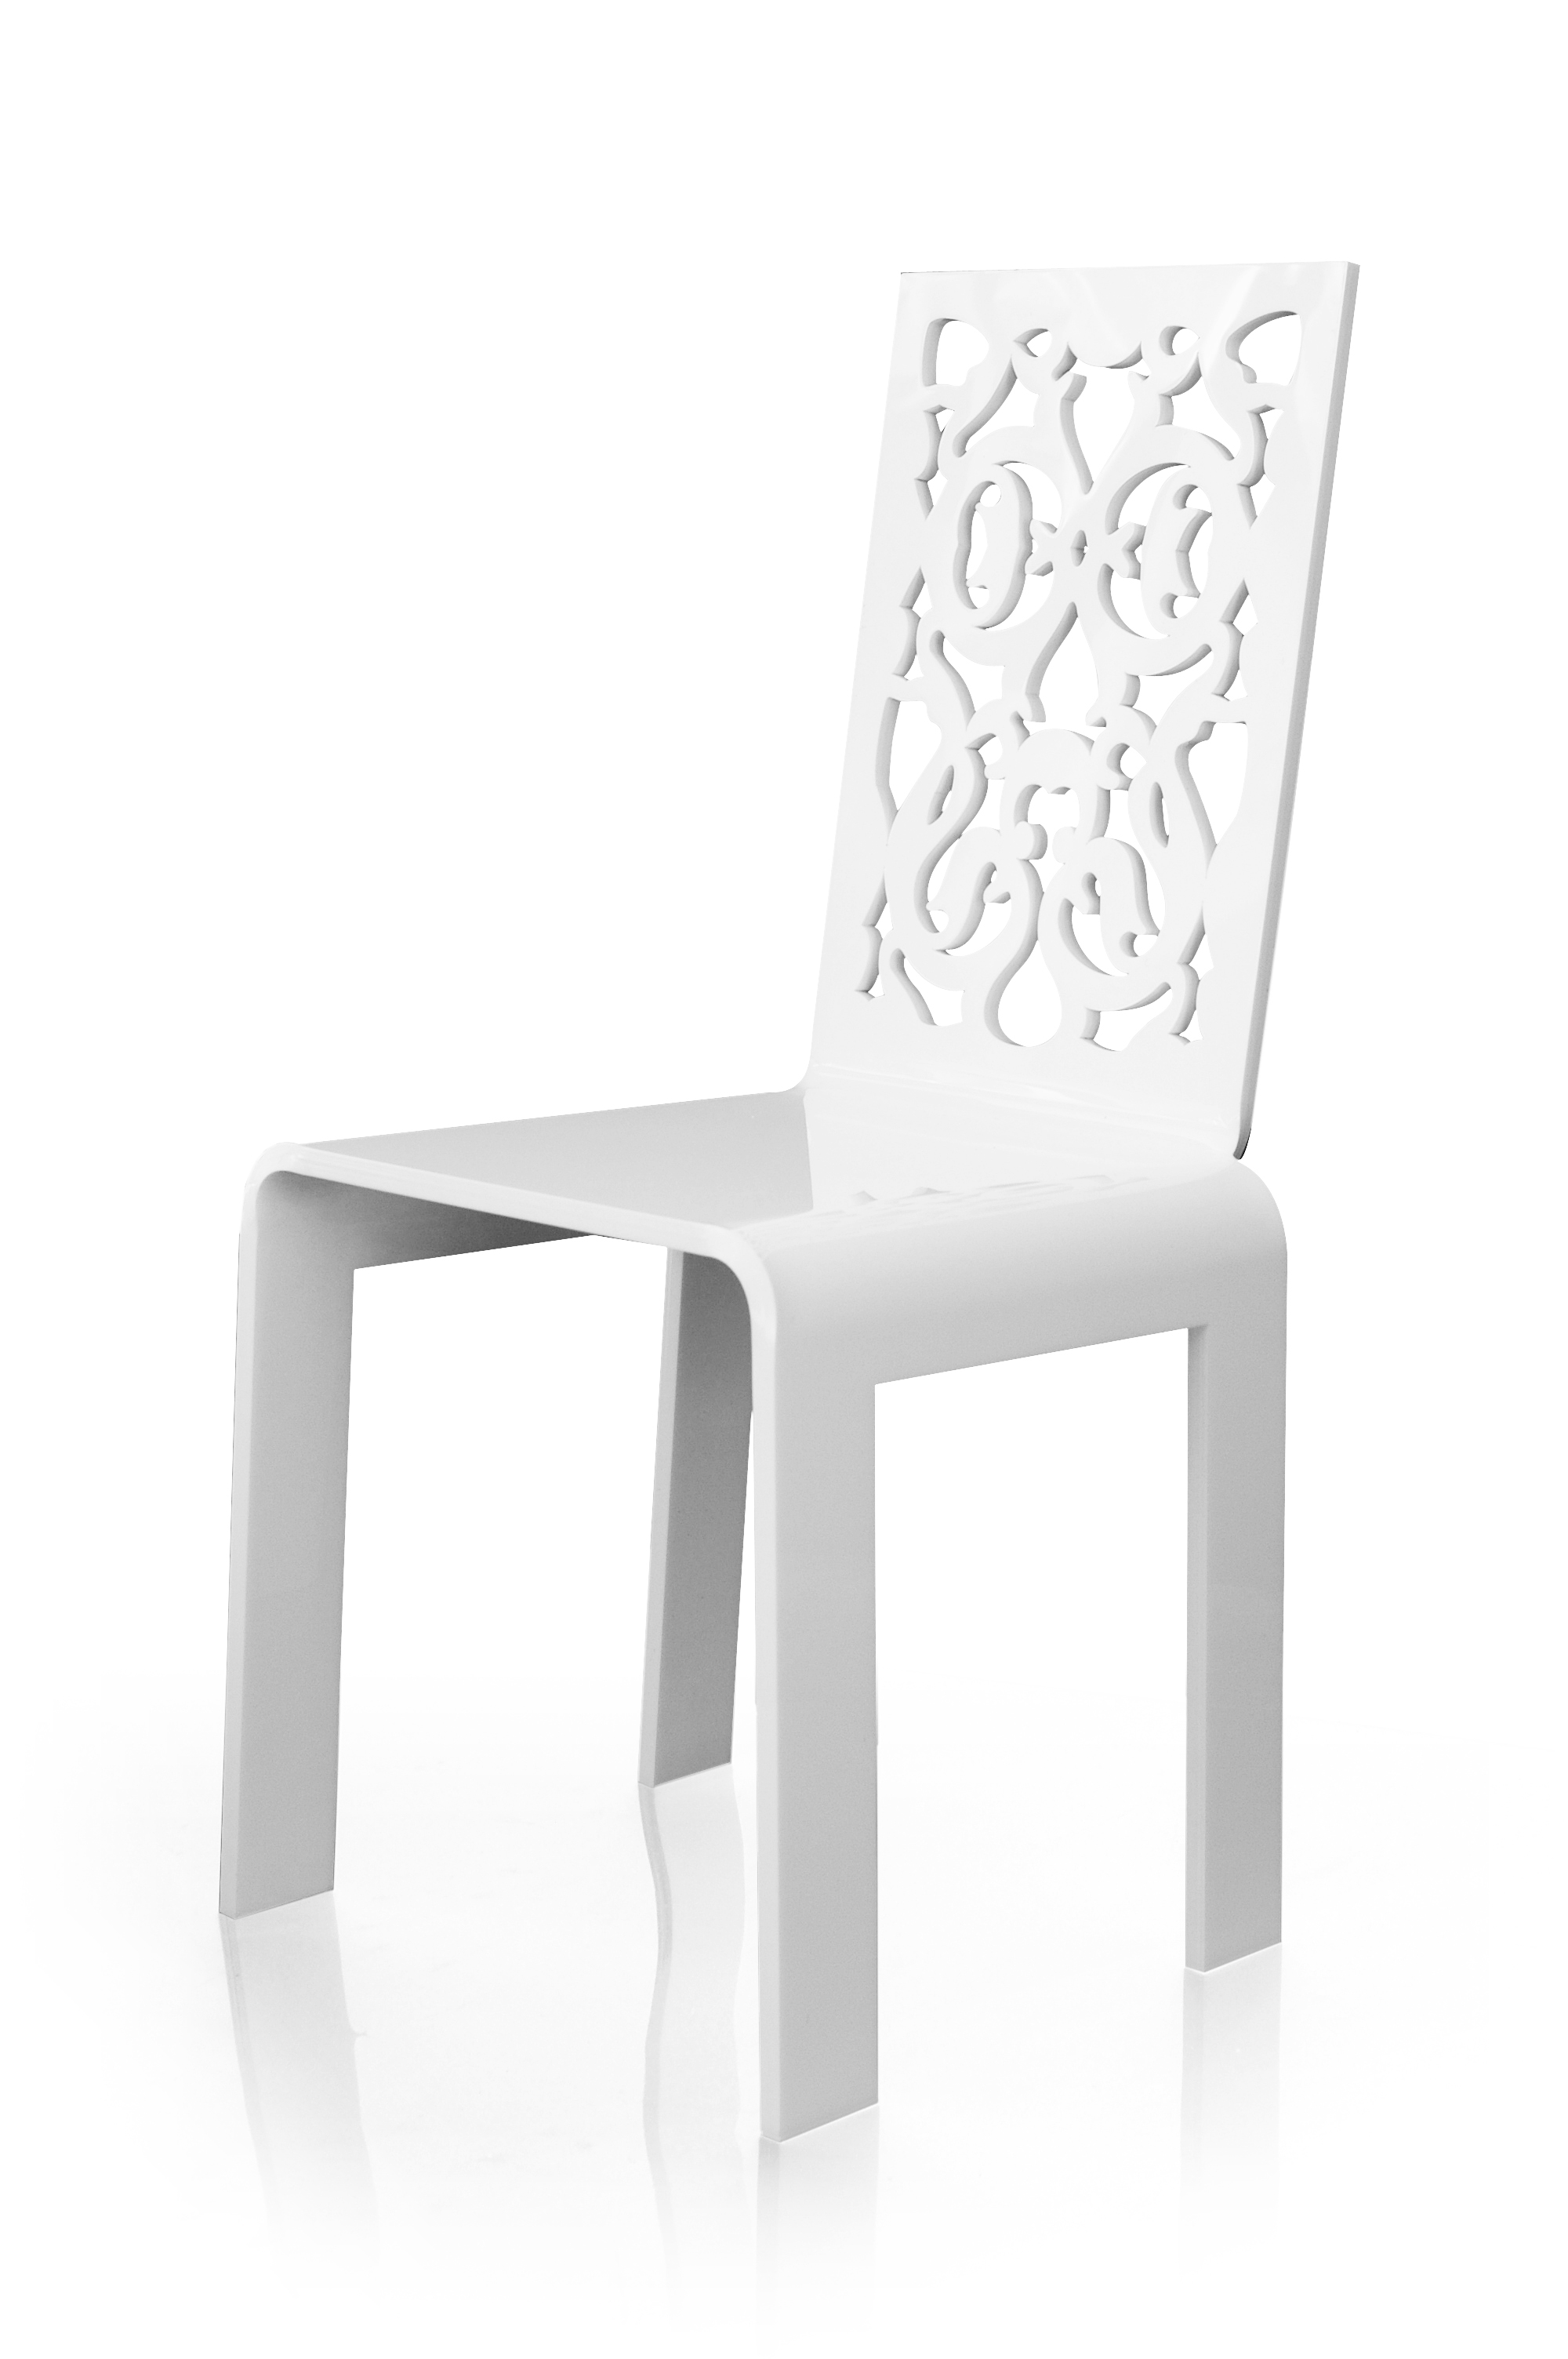 Chaise dentelle blanche.jpg